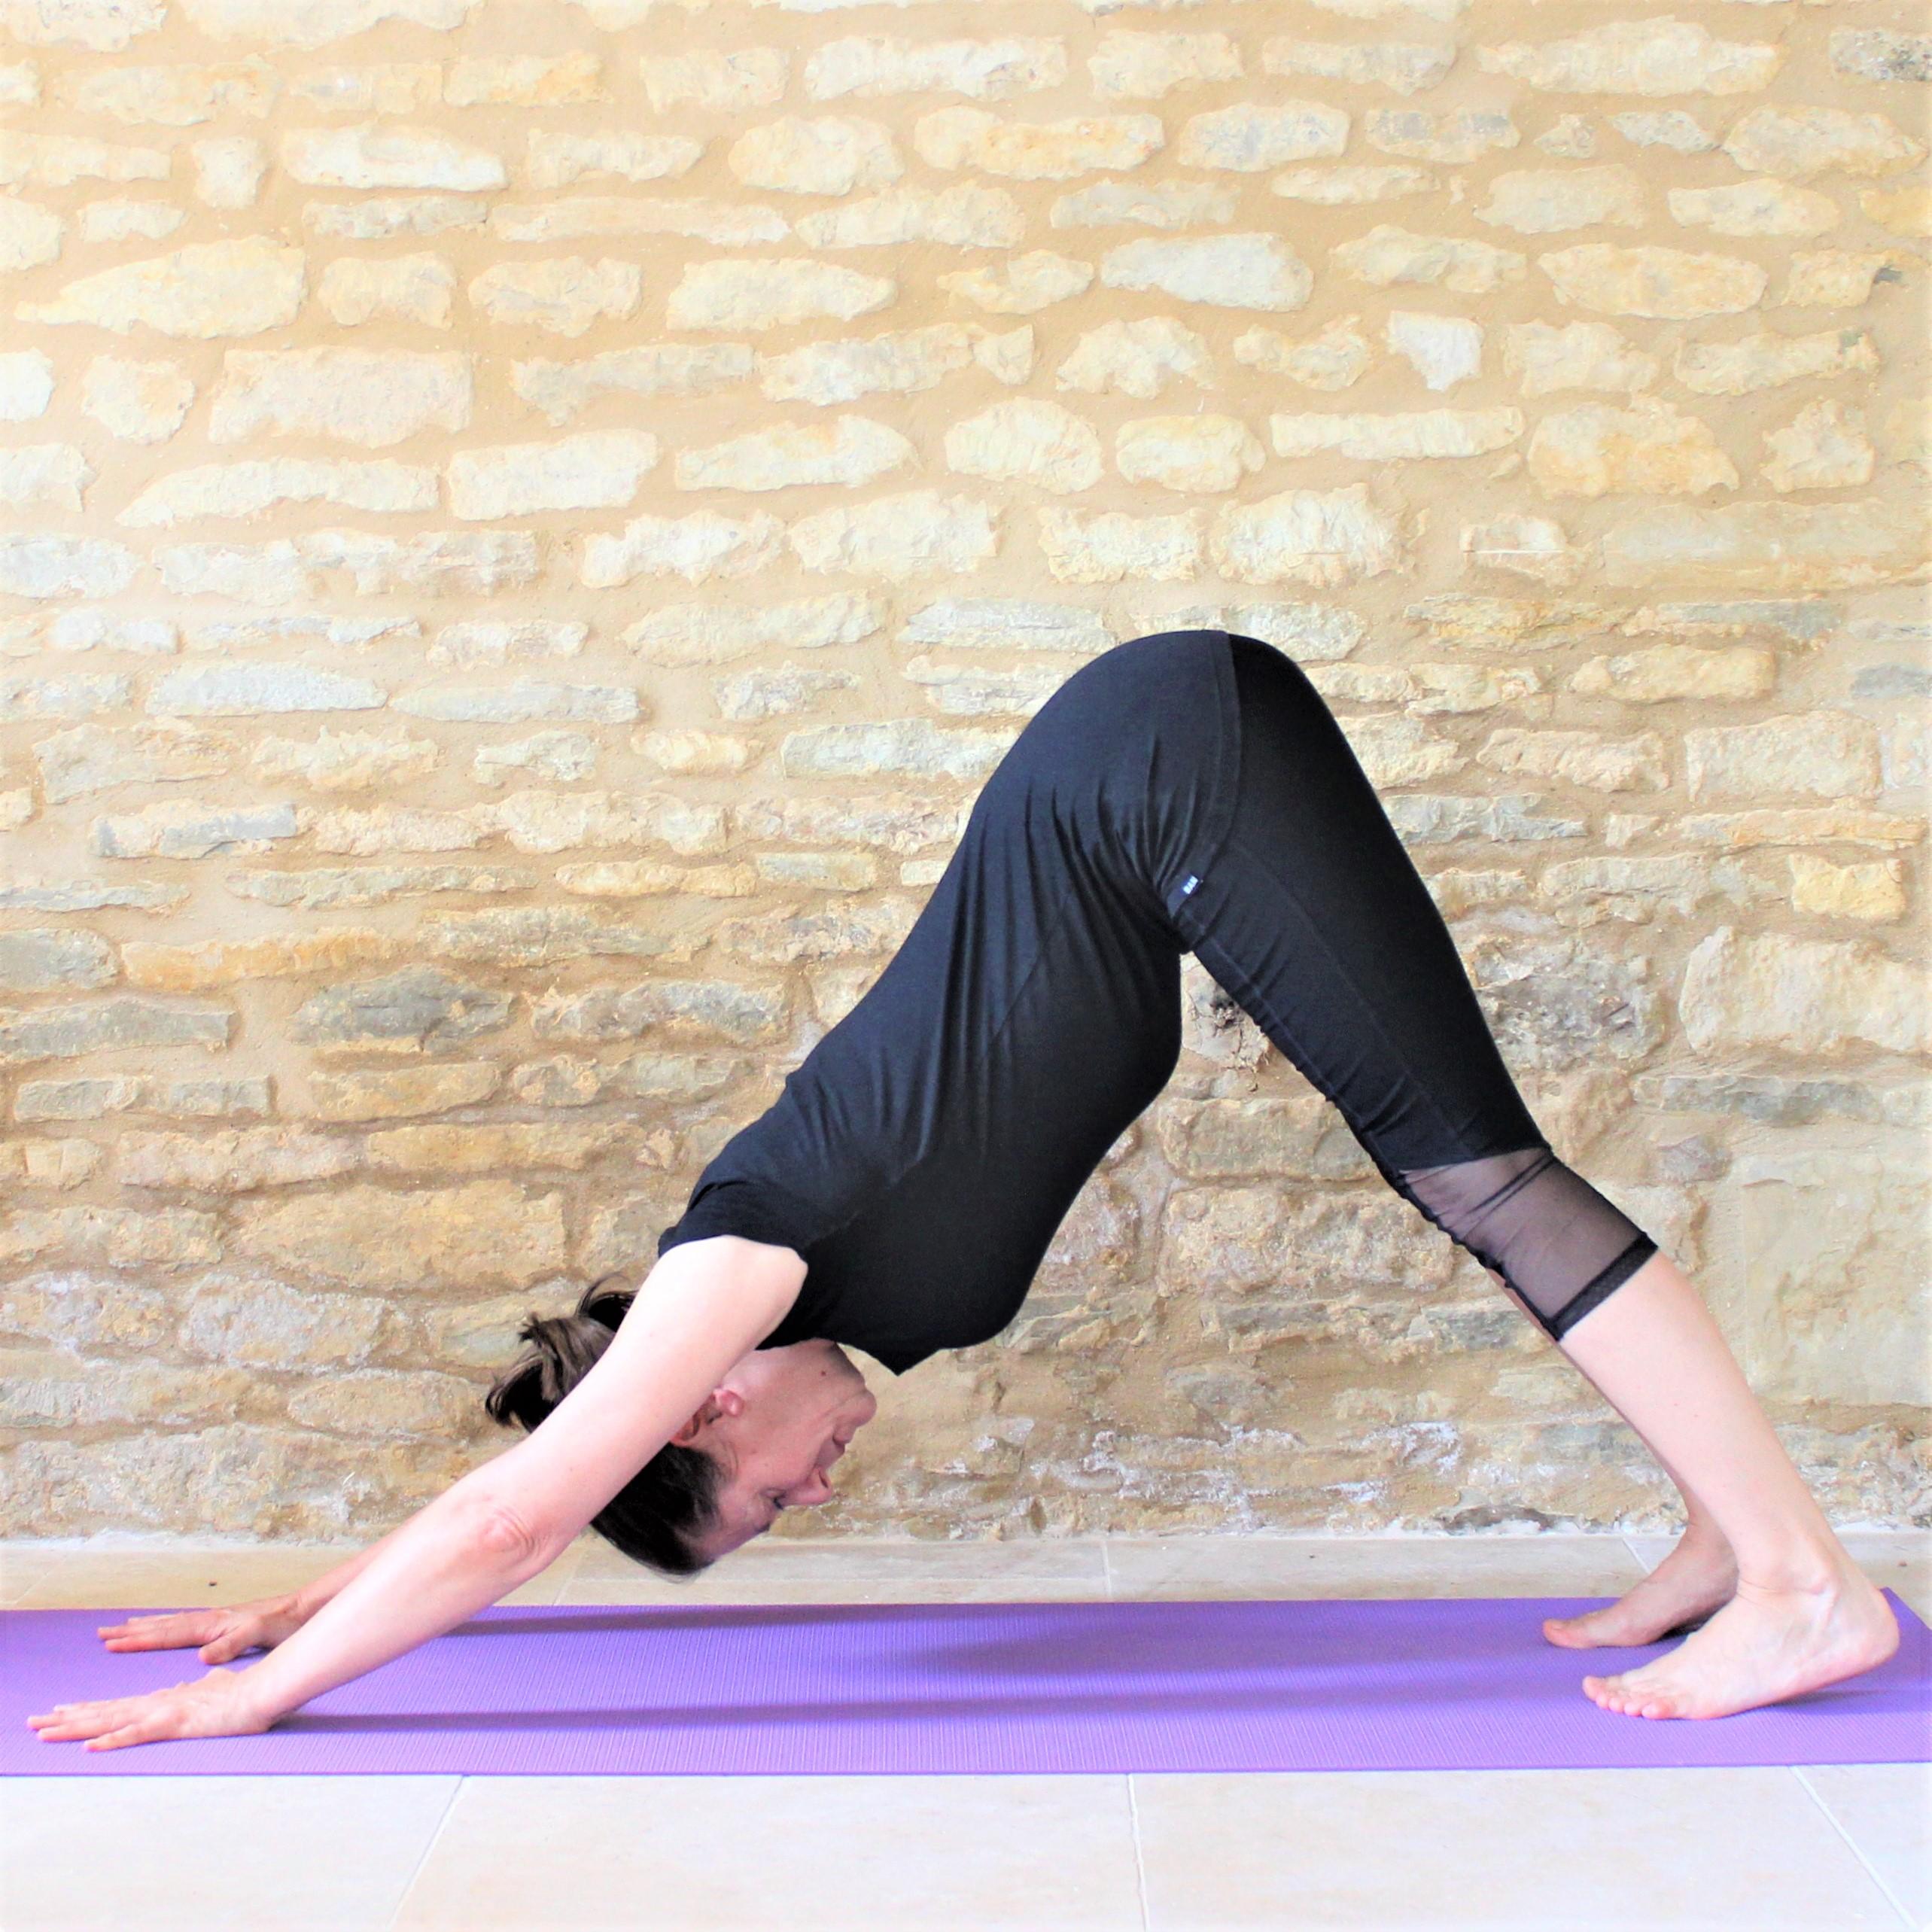 exaple yoga classes in stamford Yoga Teacher Deborah King demonstrates Downward Dog pose